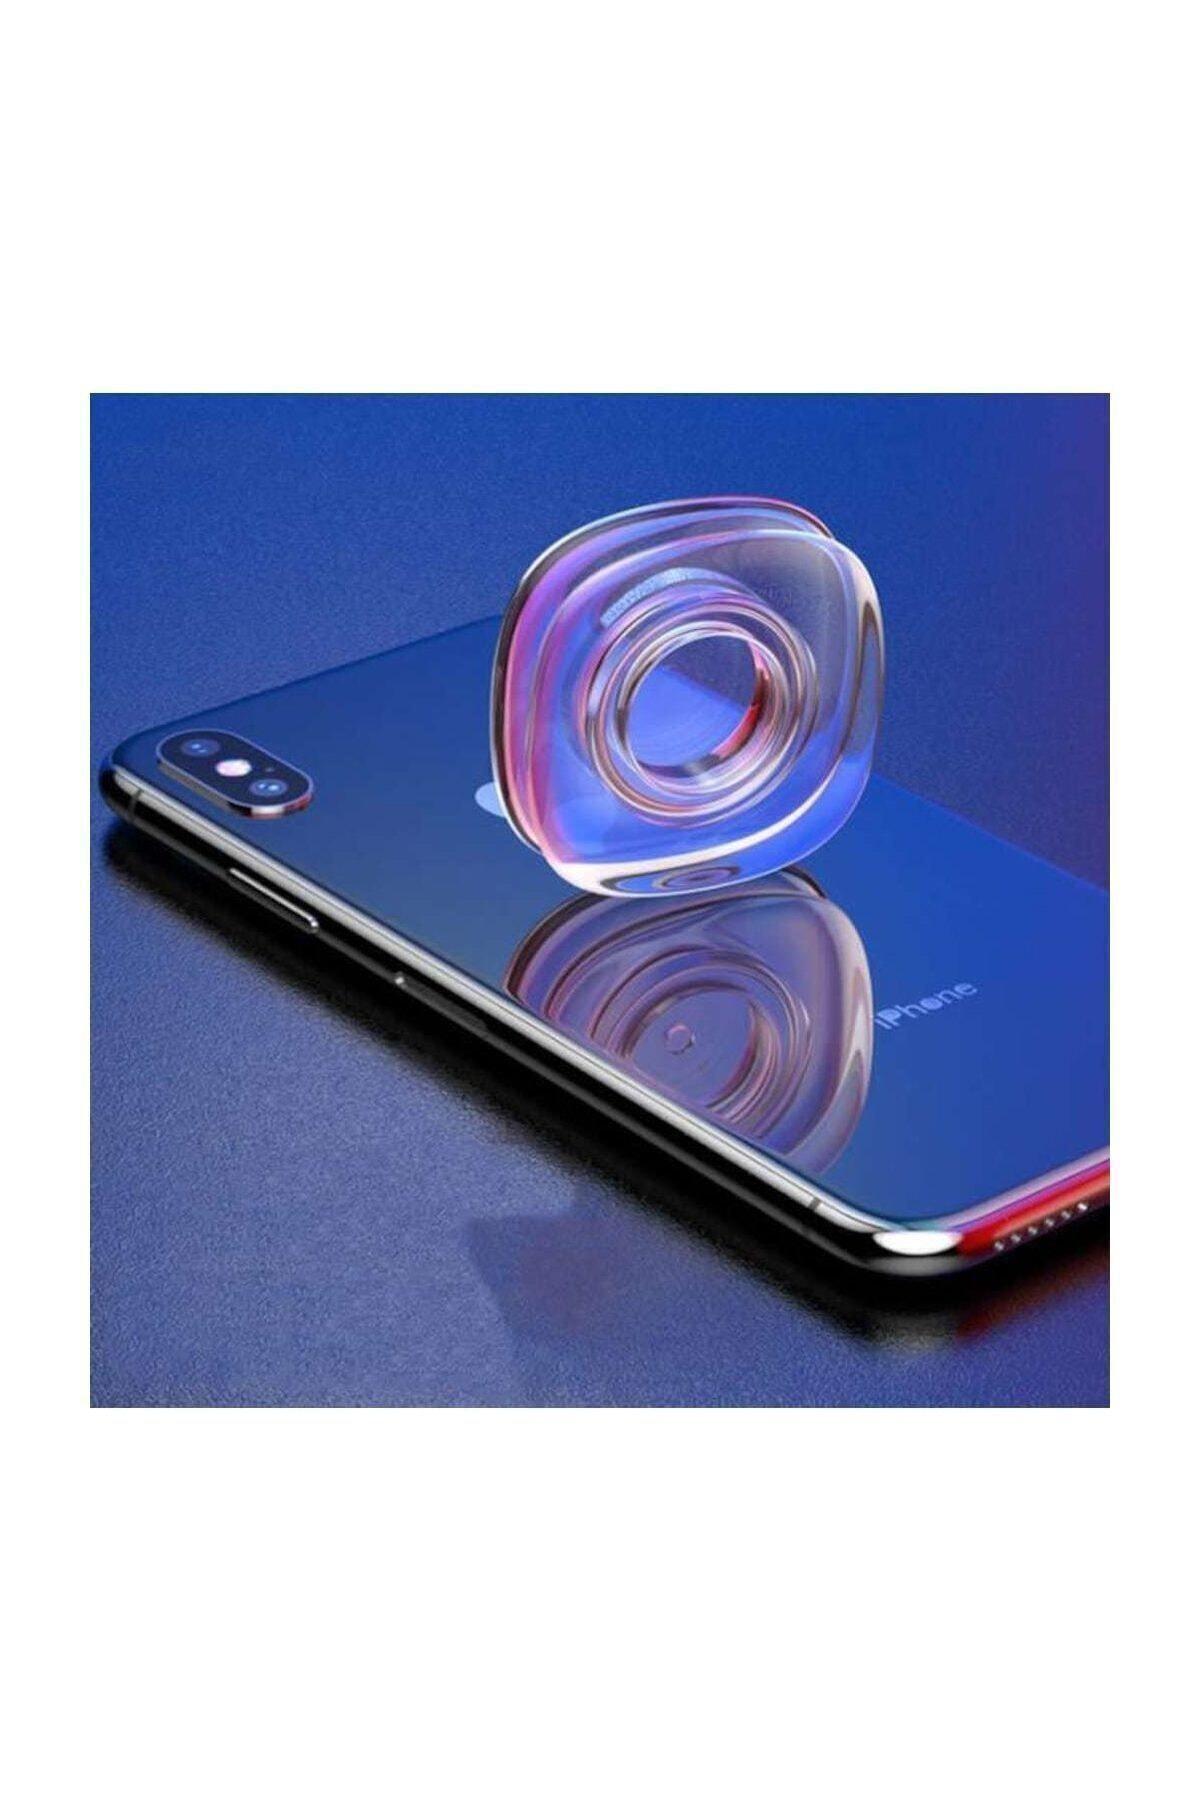 Nano Jel Slikon Ped Çok Fonksiyonlu Telefon Tutucu 1